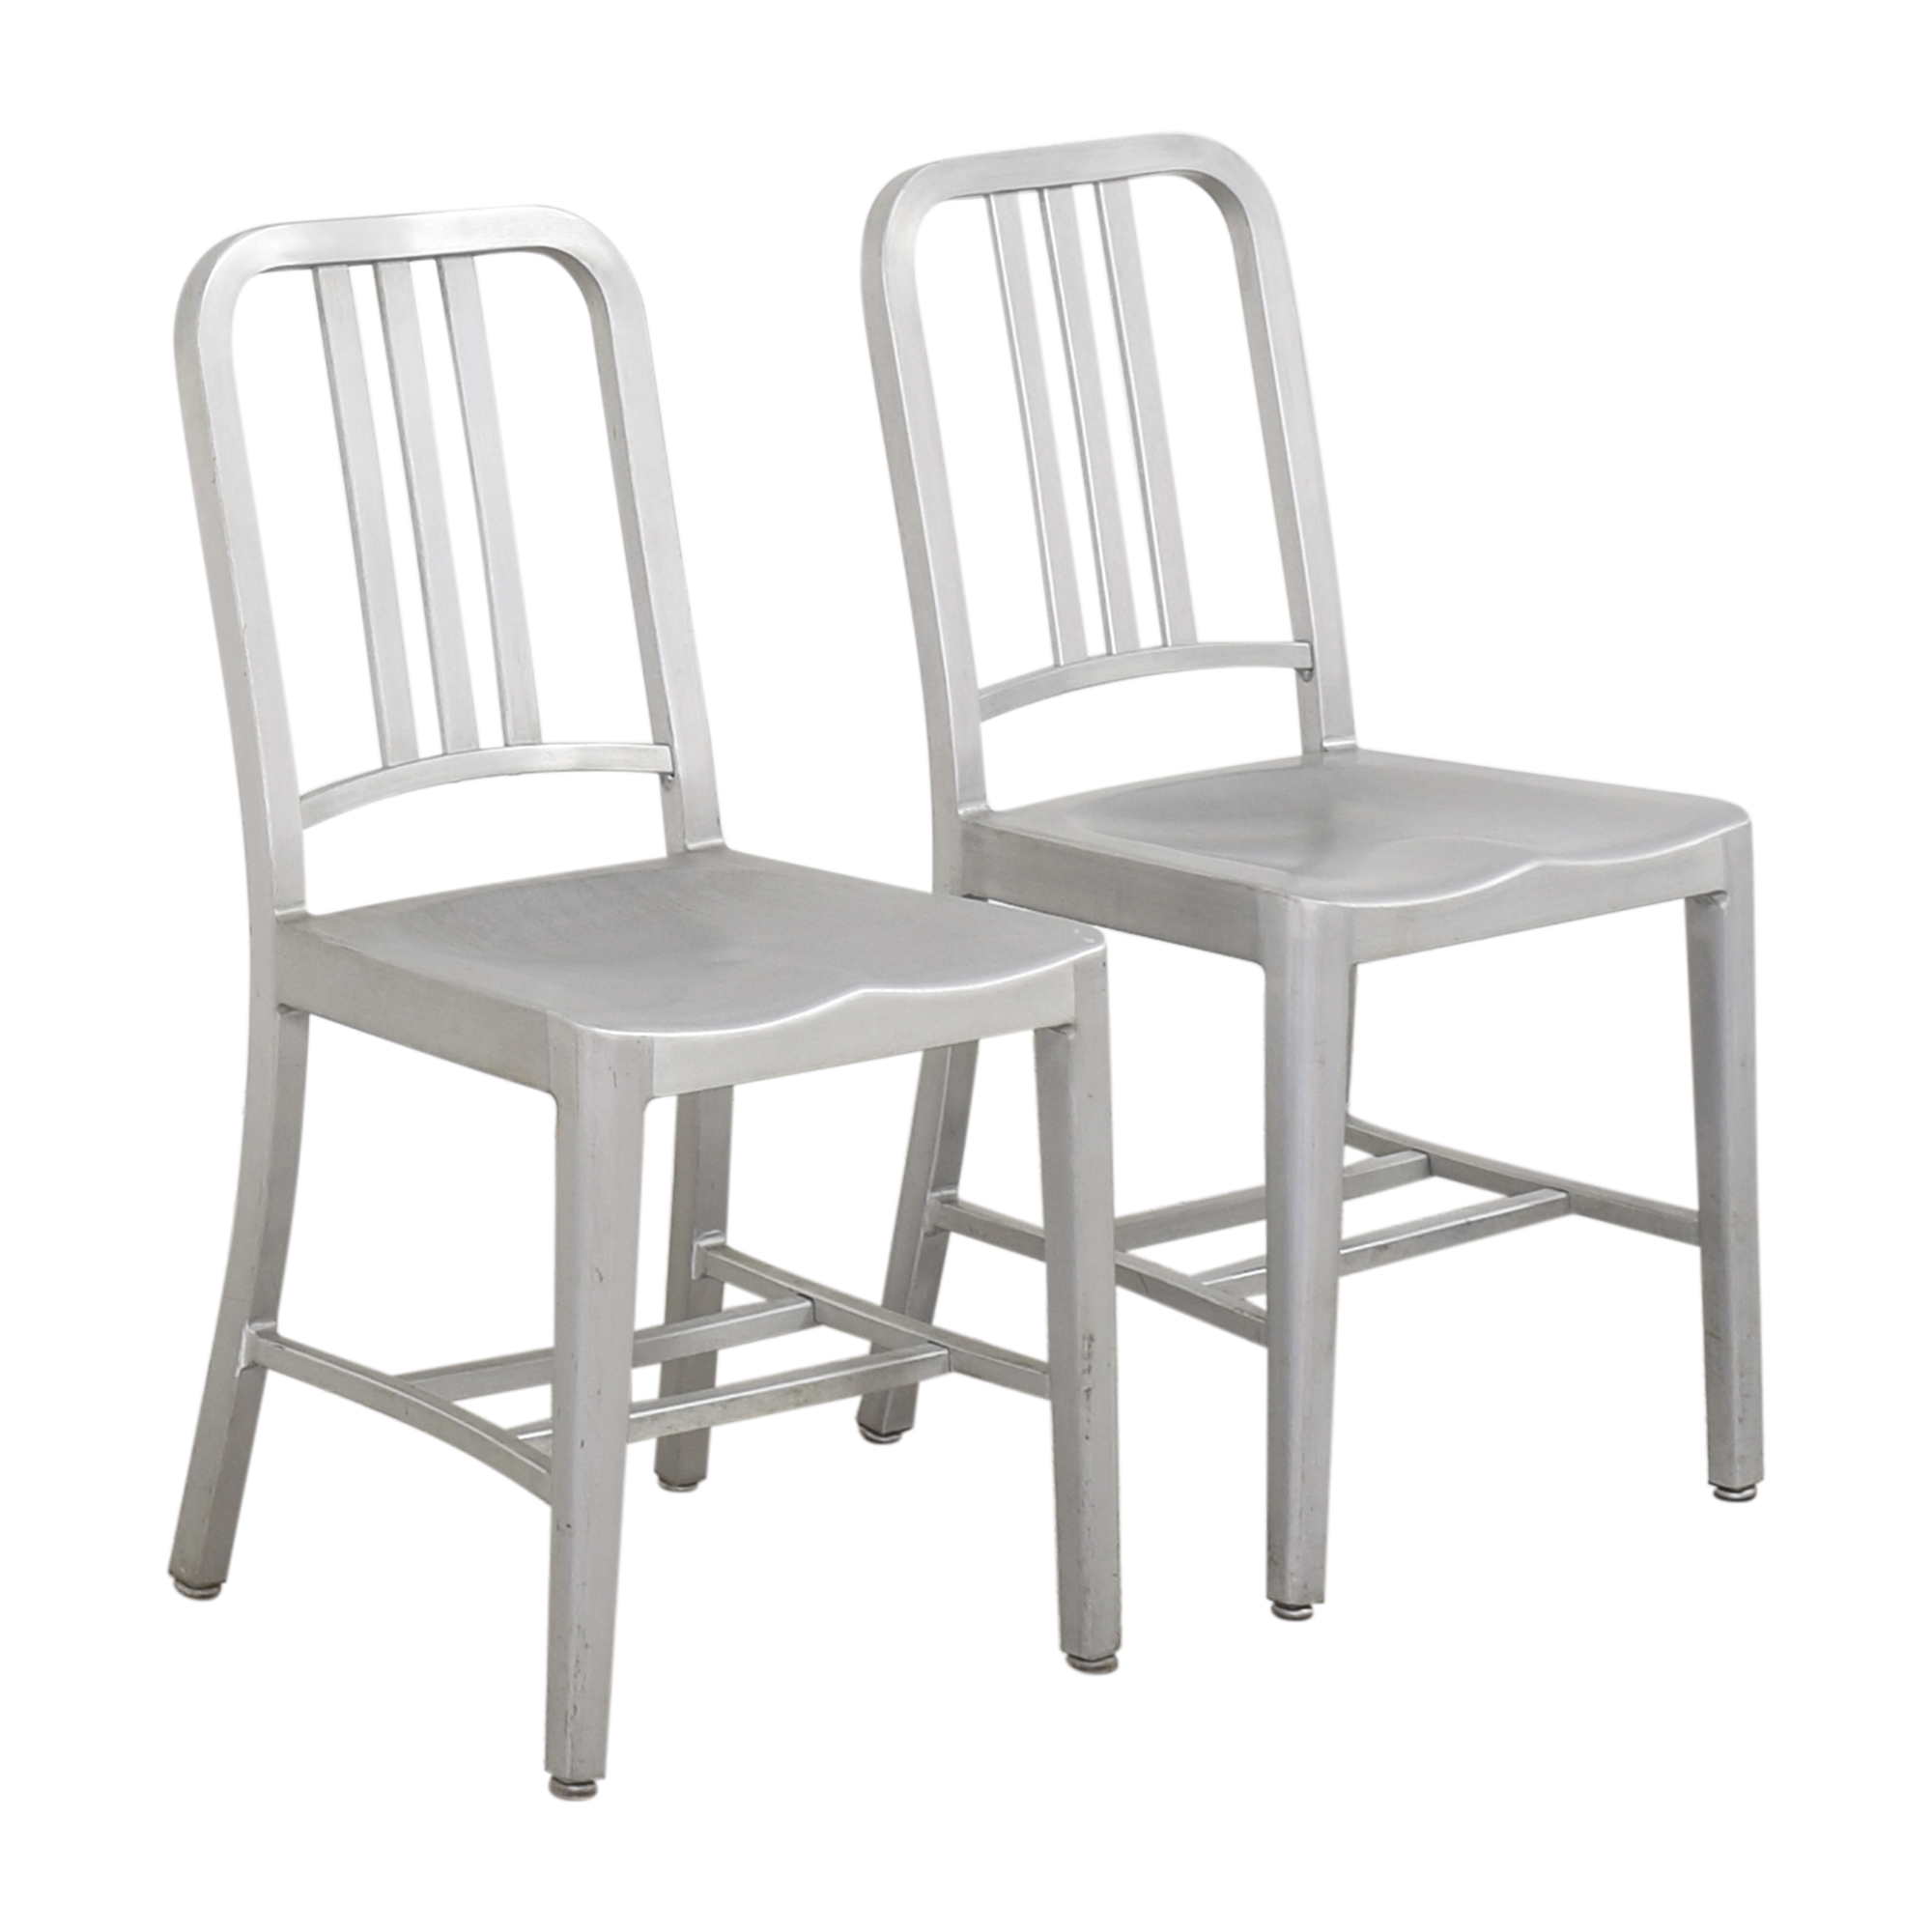 buy Emeco Navy Chairs Emeco Chairs